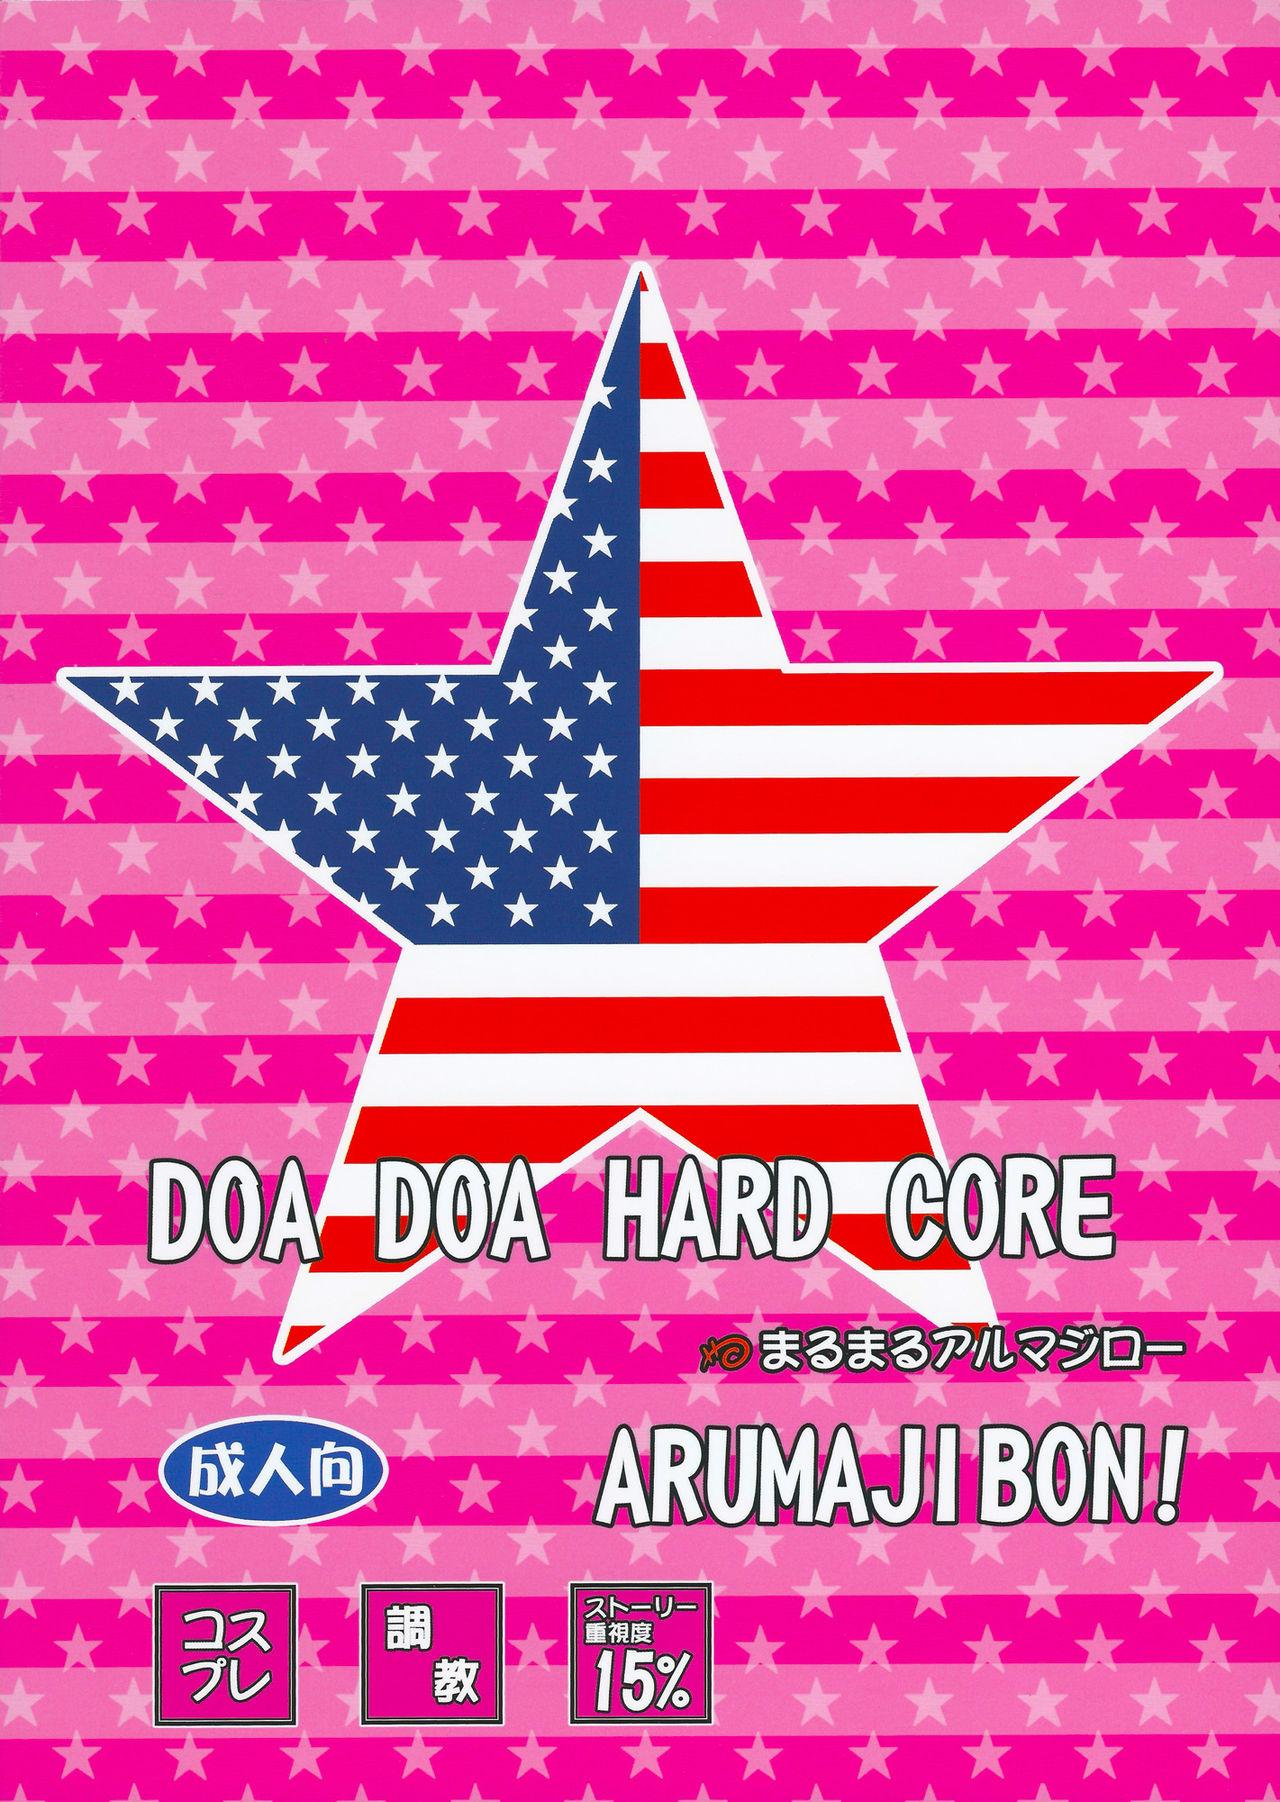 DOA DOA HARD CORE 33